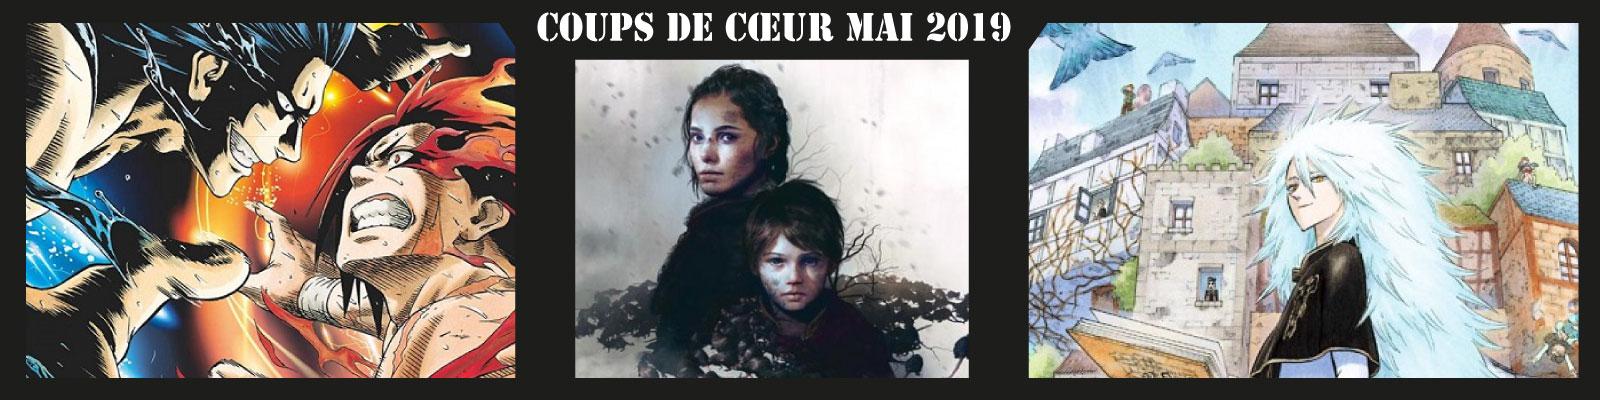 Coups-de-cœur-mai 2019